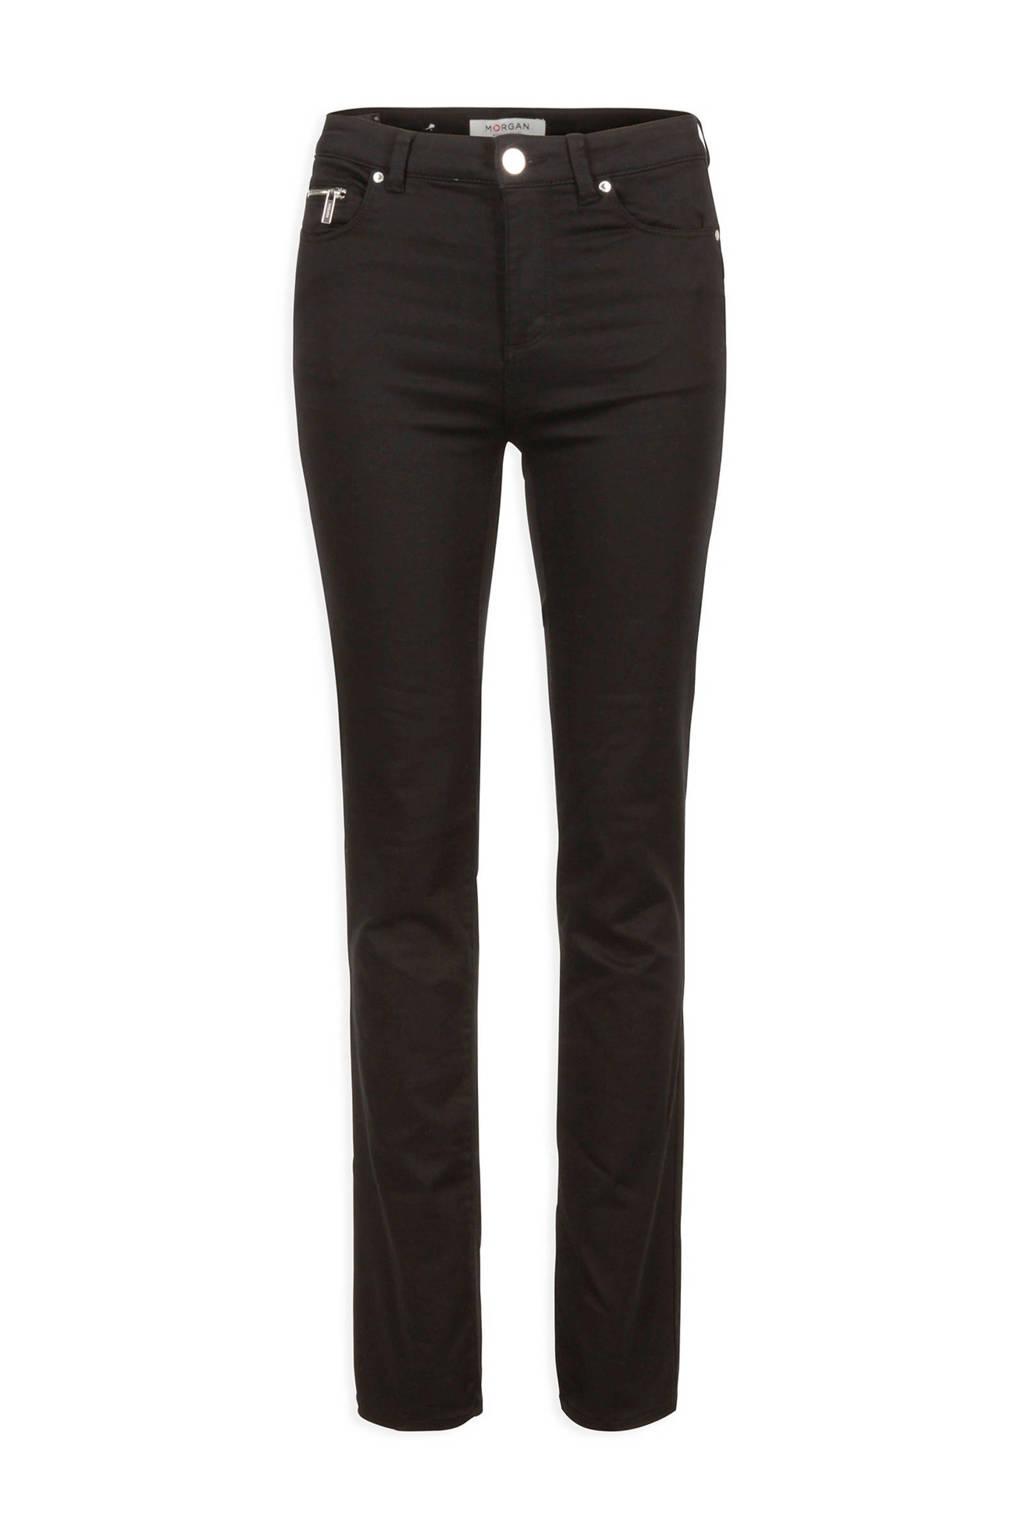 Morgan straight fit broek zwart, Zwart